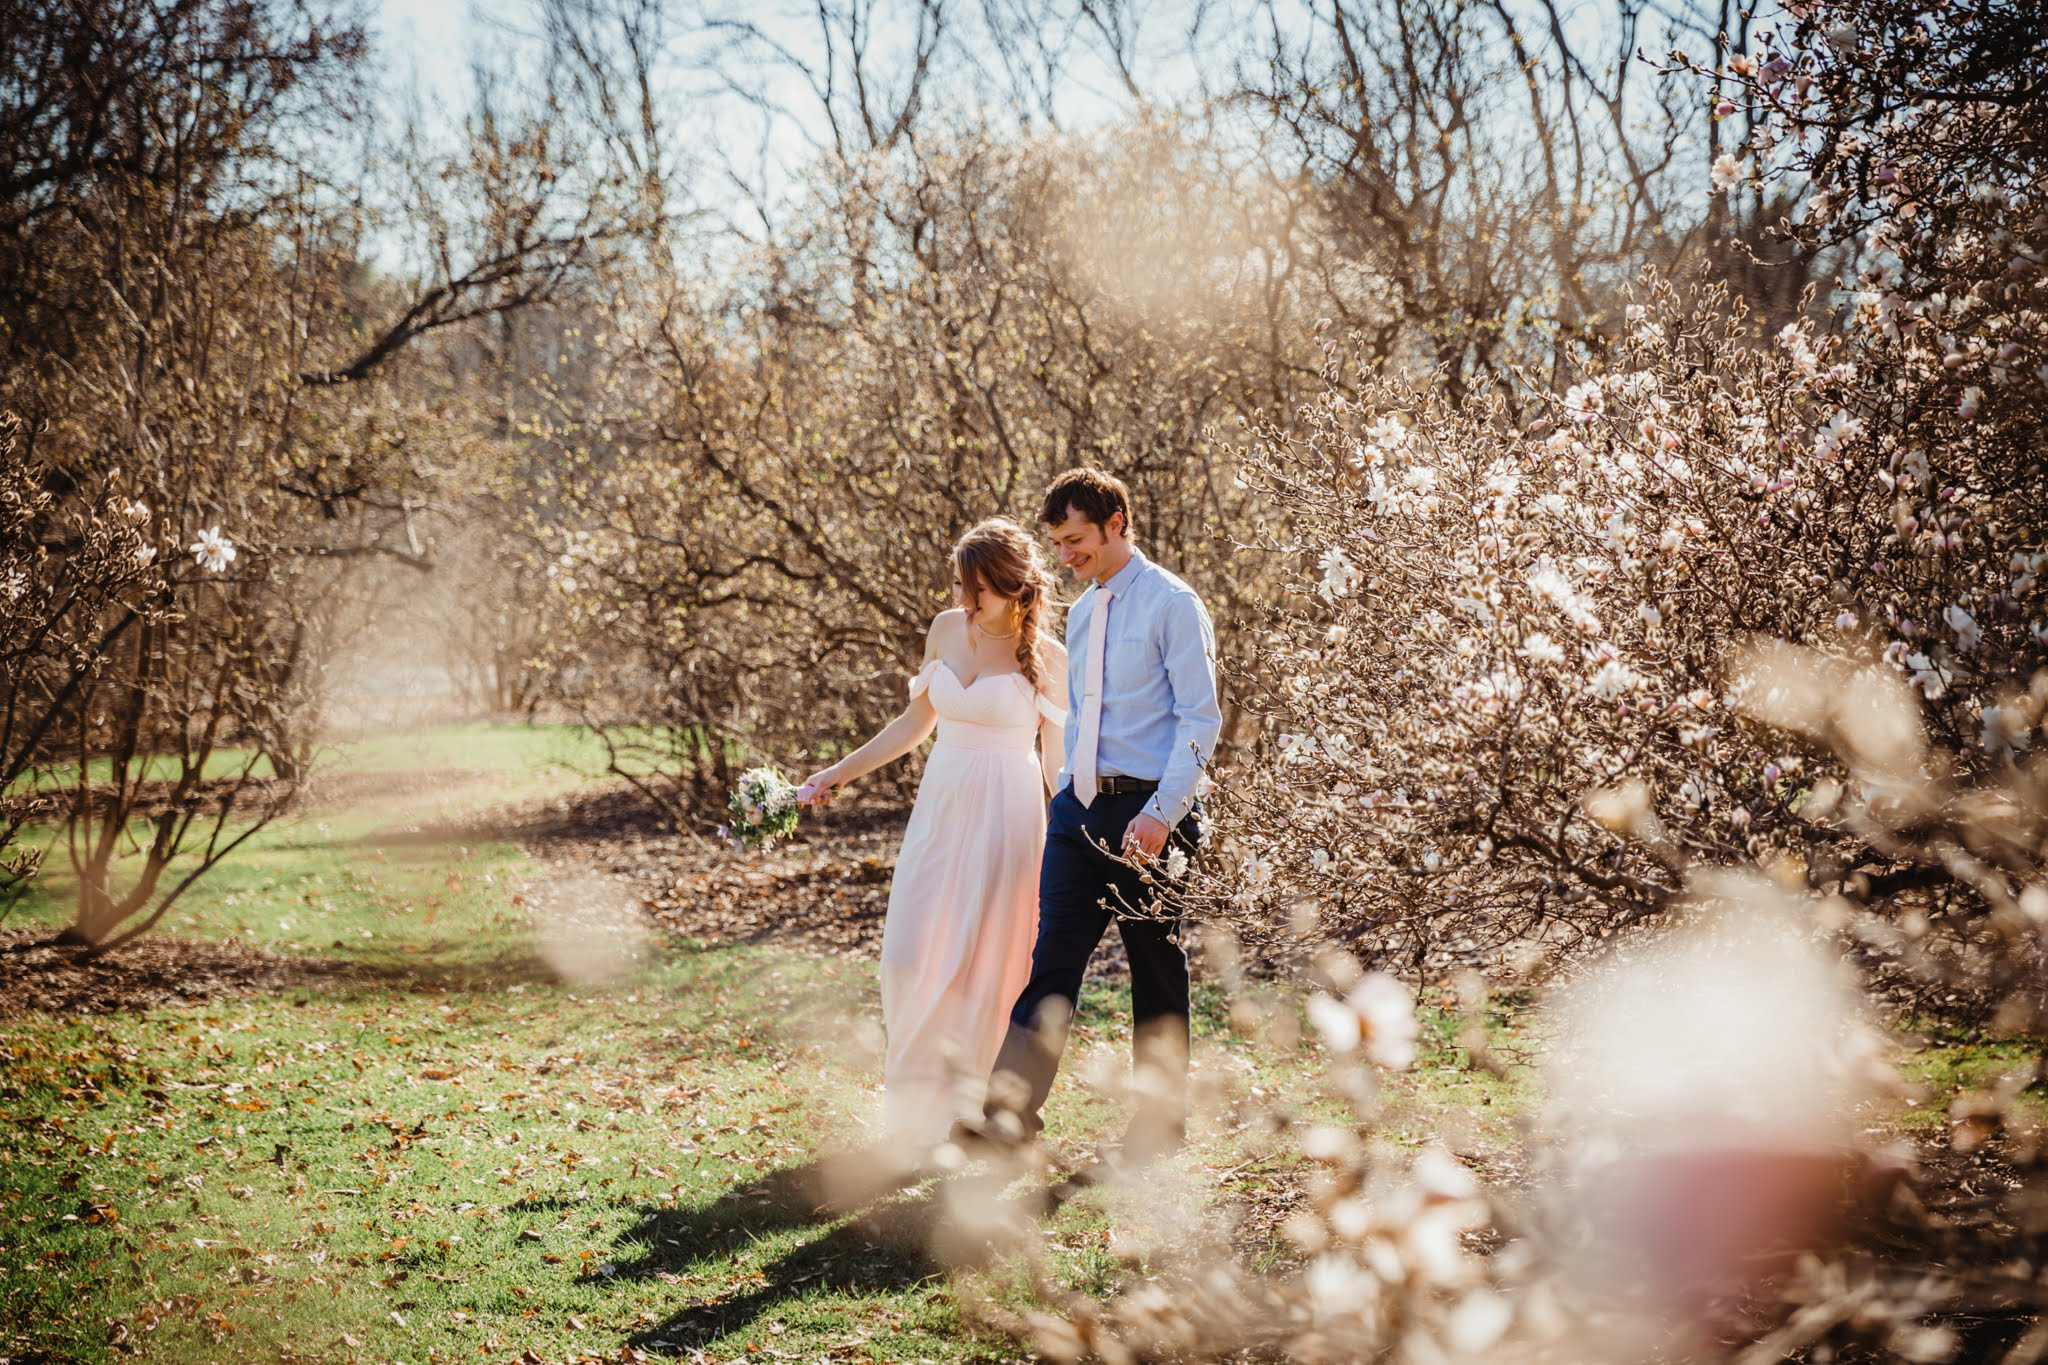 Blush Bridesmaid Dress - Spring Wedding at the UW Madison Arboretum in Madison Wisconsin - Phoenix & Rose Photography